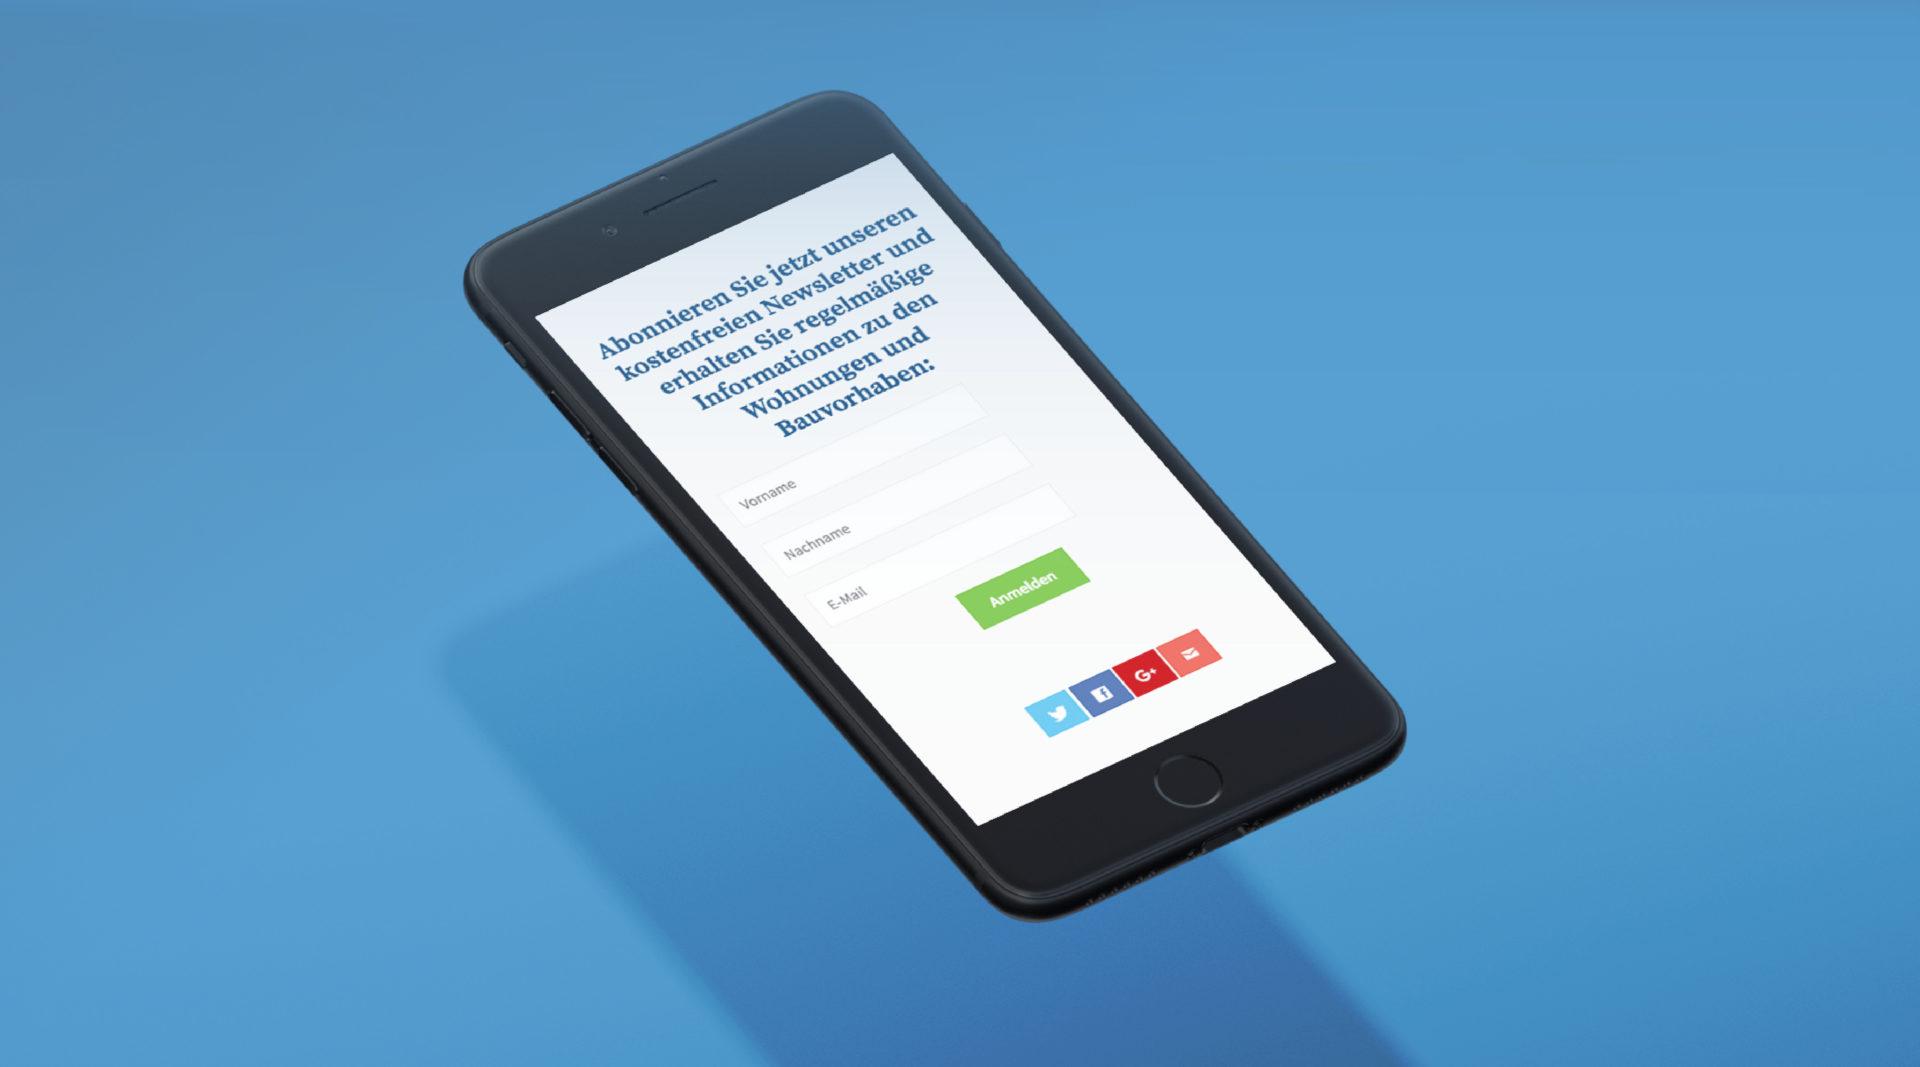 Bb Wohnbau Referenz 2 Responsive Mobile Webdesign